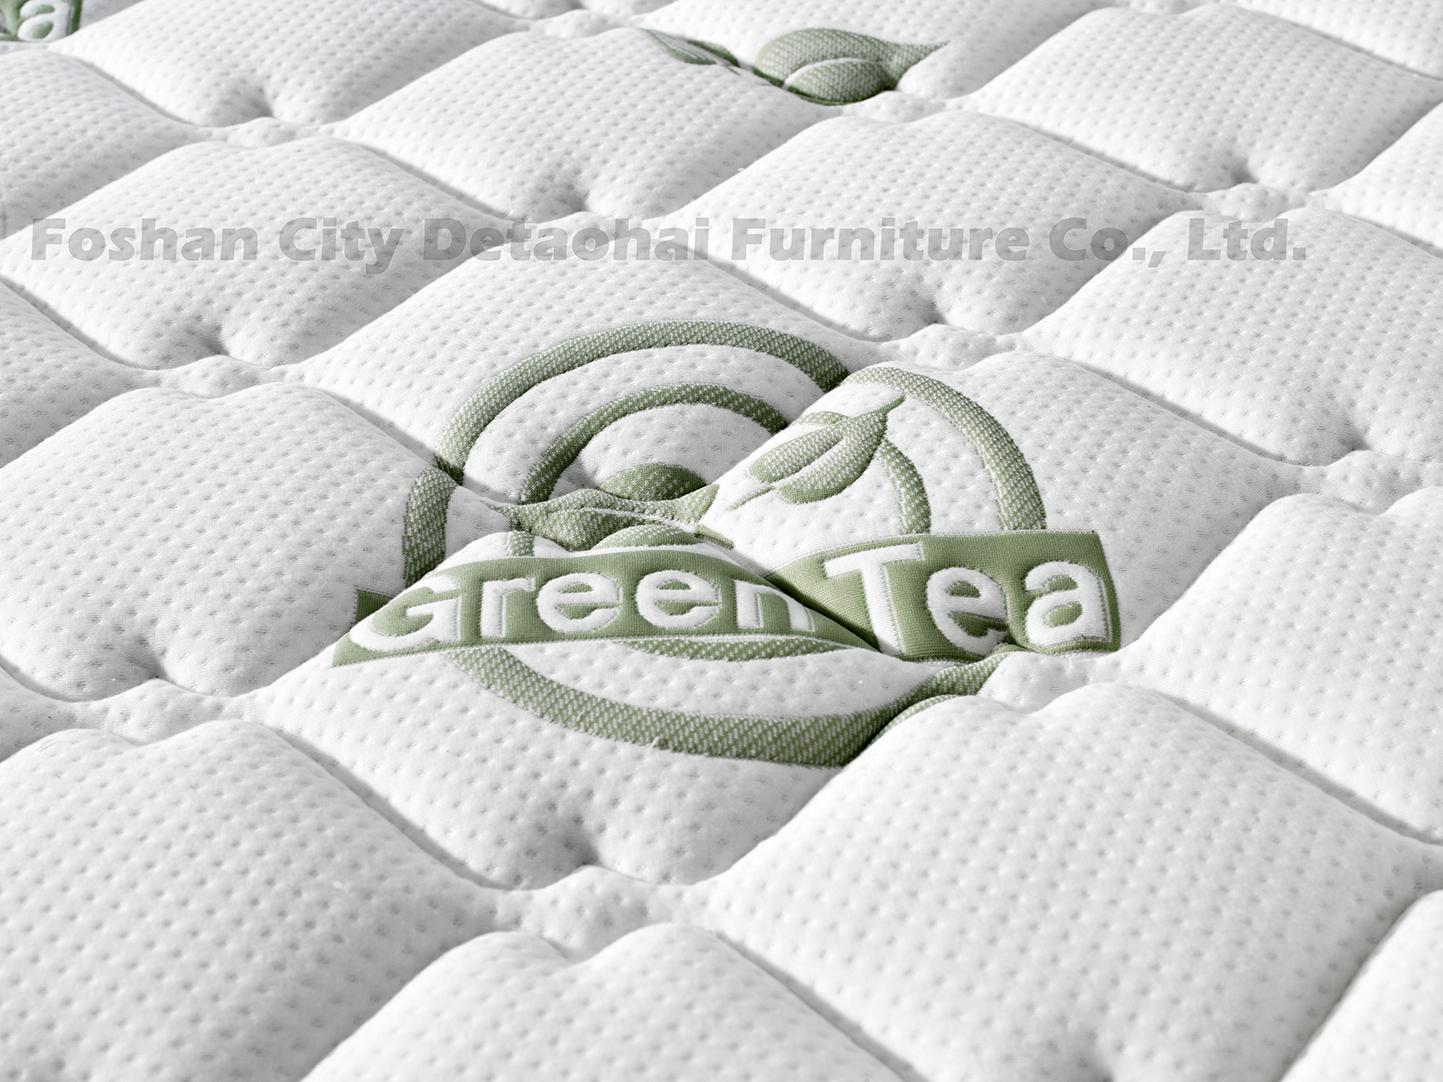 pocket spring latex mattress green tea plant knitted fabric compression mattress 3